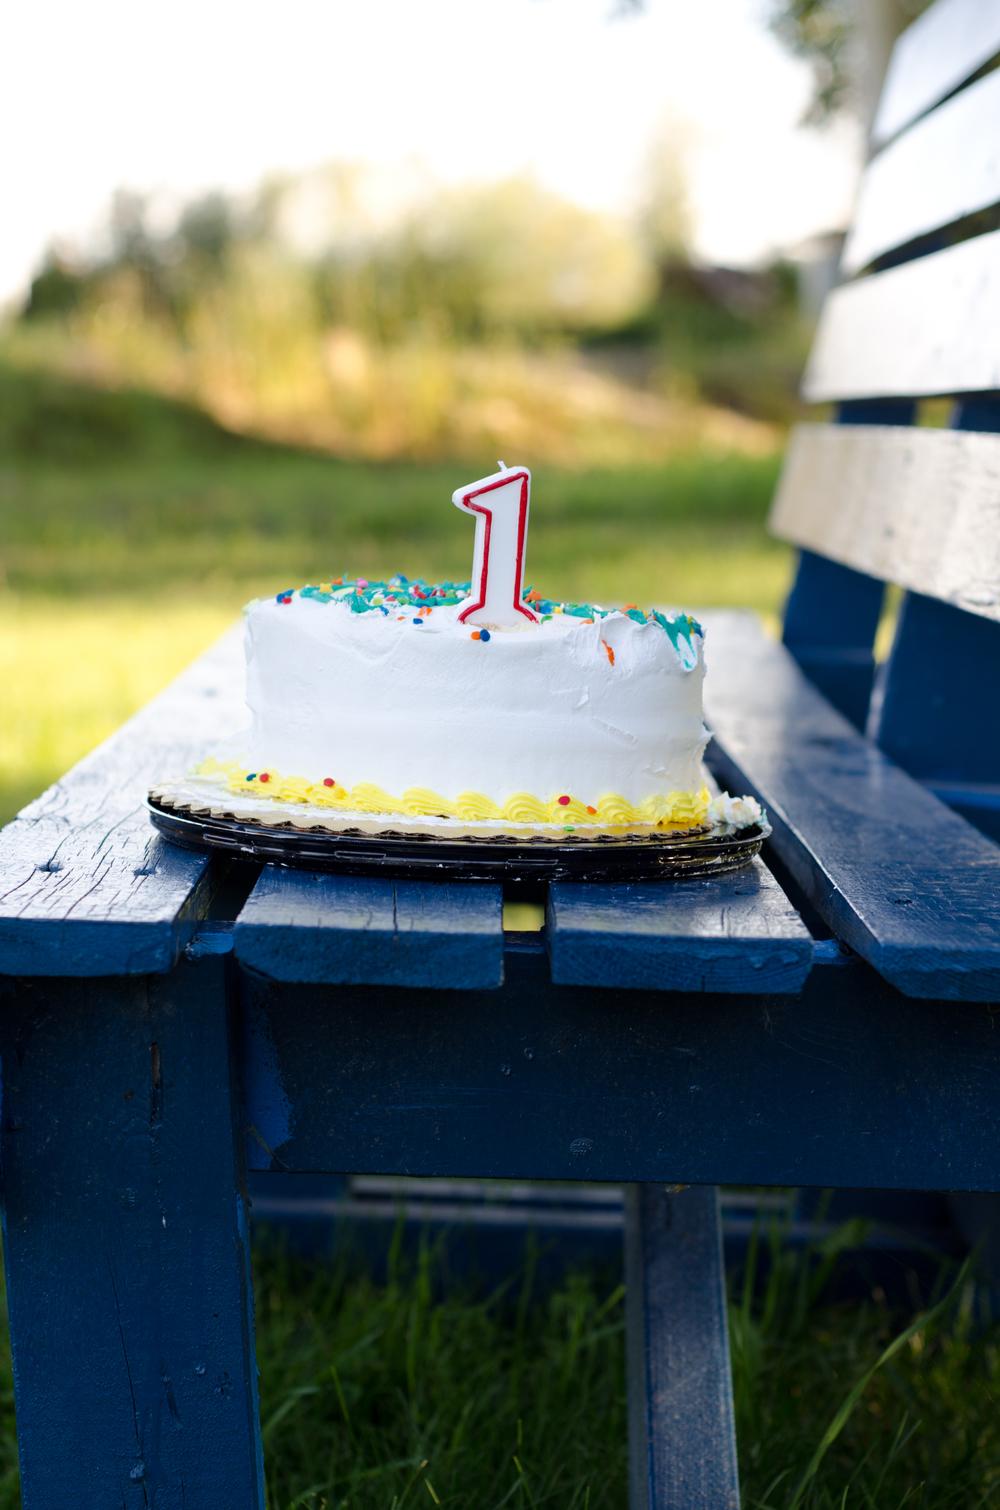 one year old cake smash cake photo - pioneer park